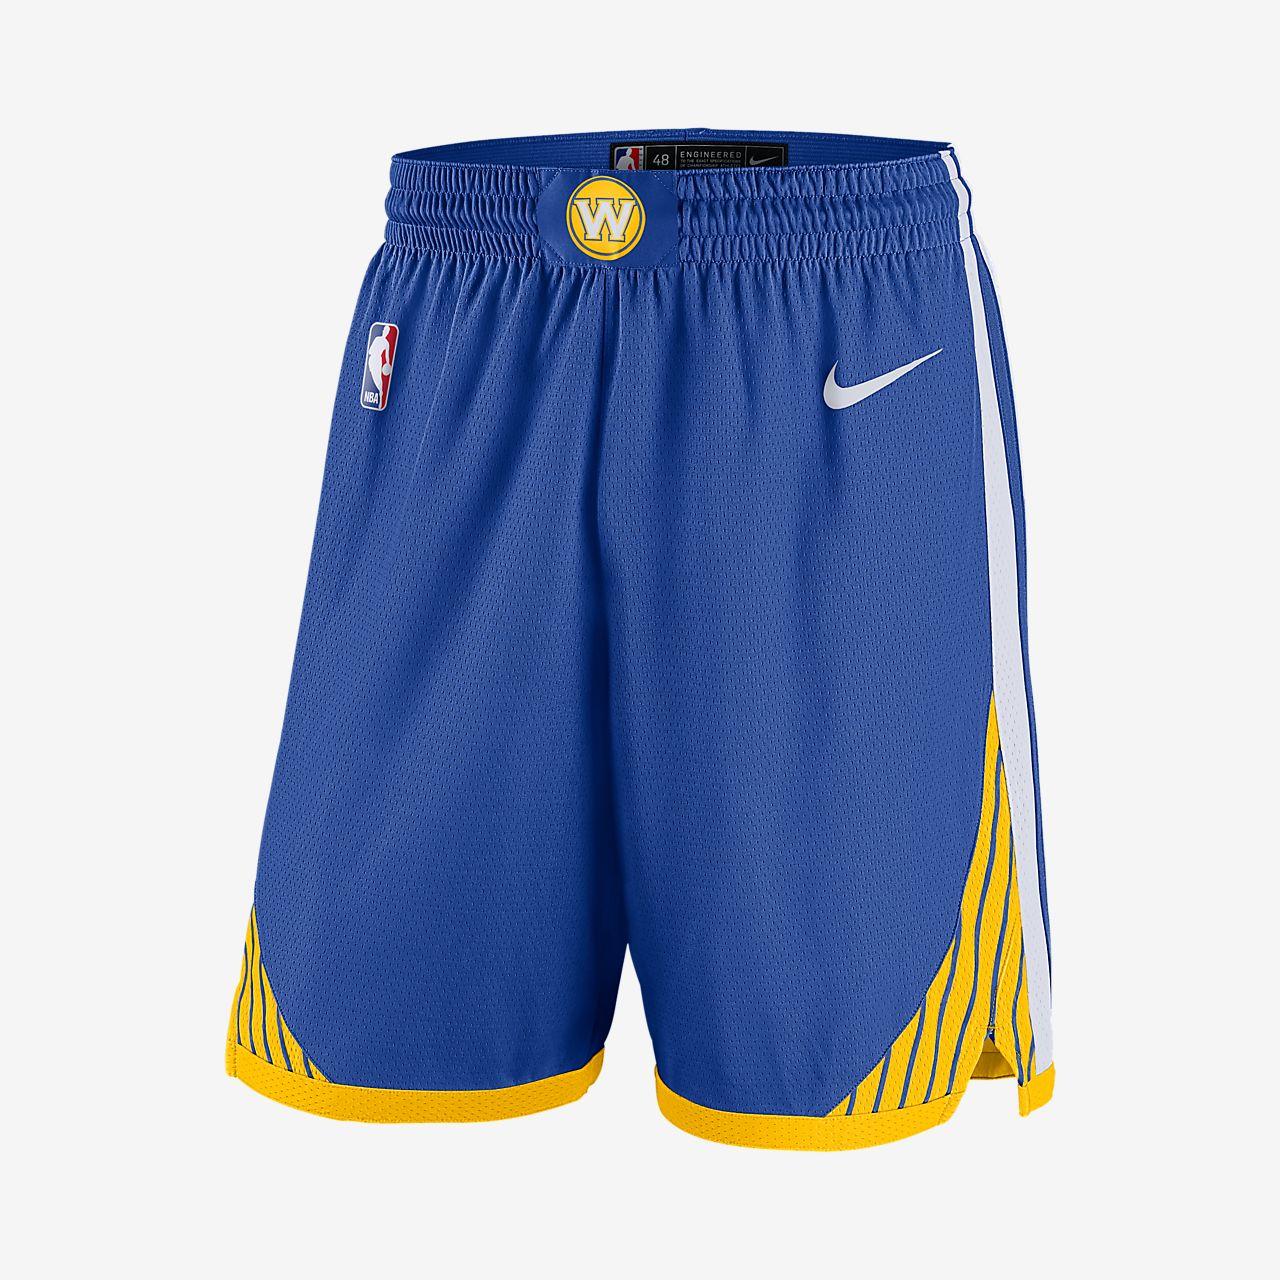 Golden state warriors swingman shorts adult